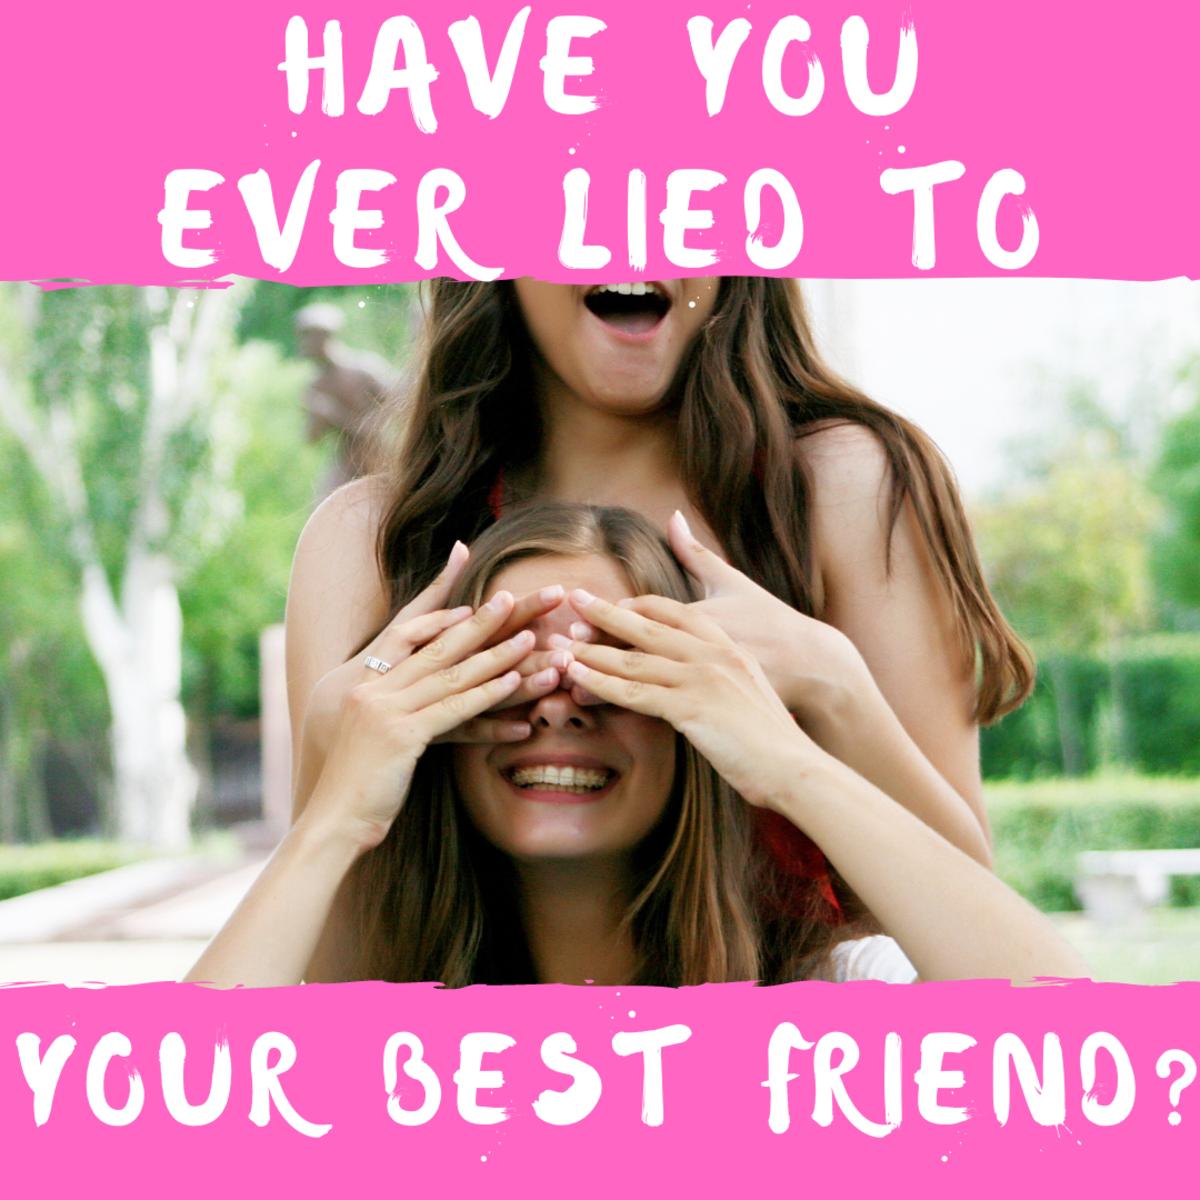 It can be a big lie or a little lie...